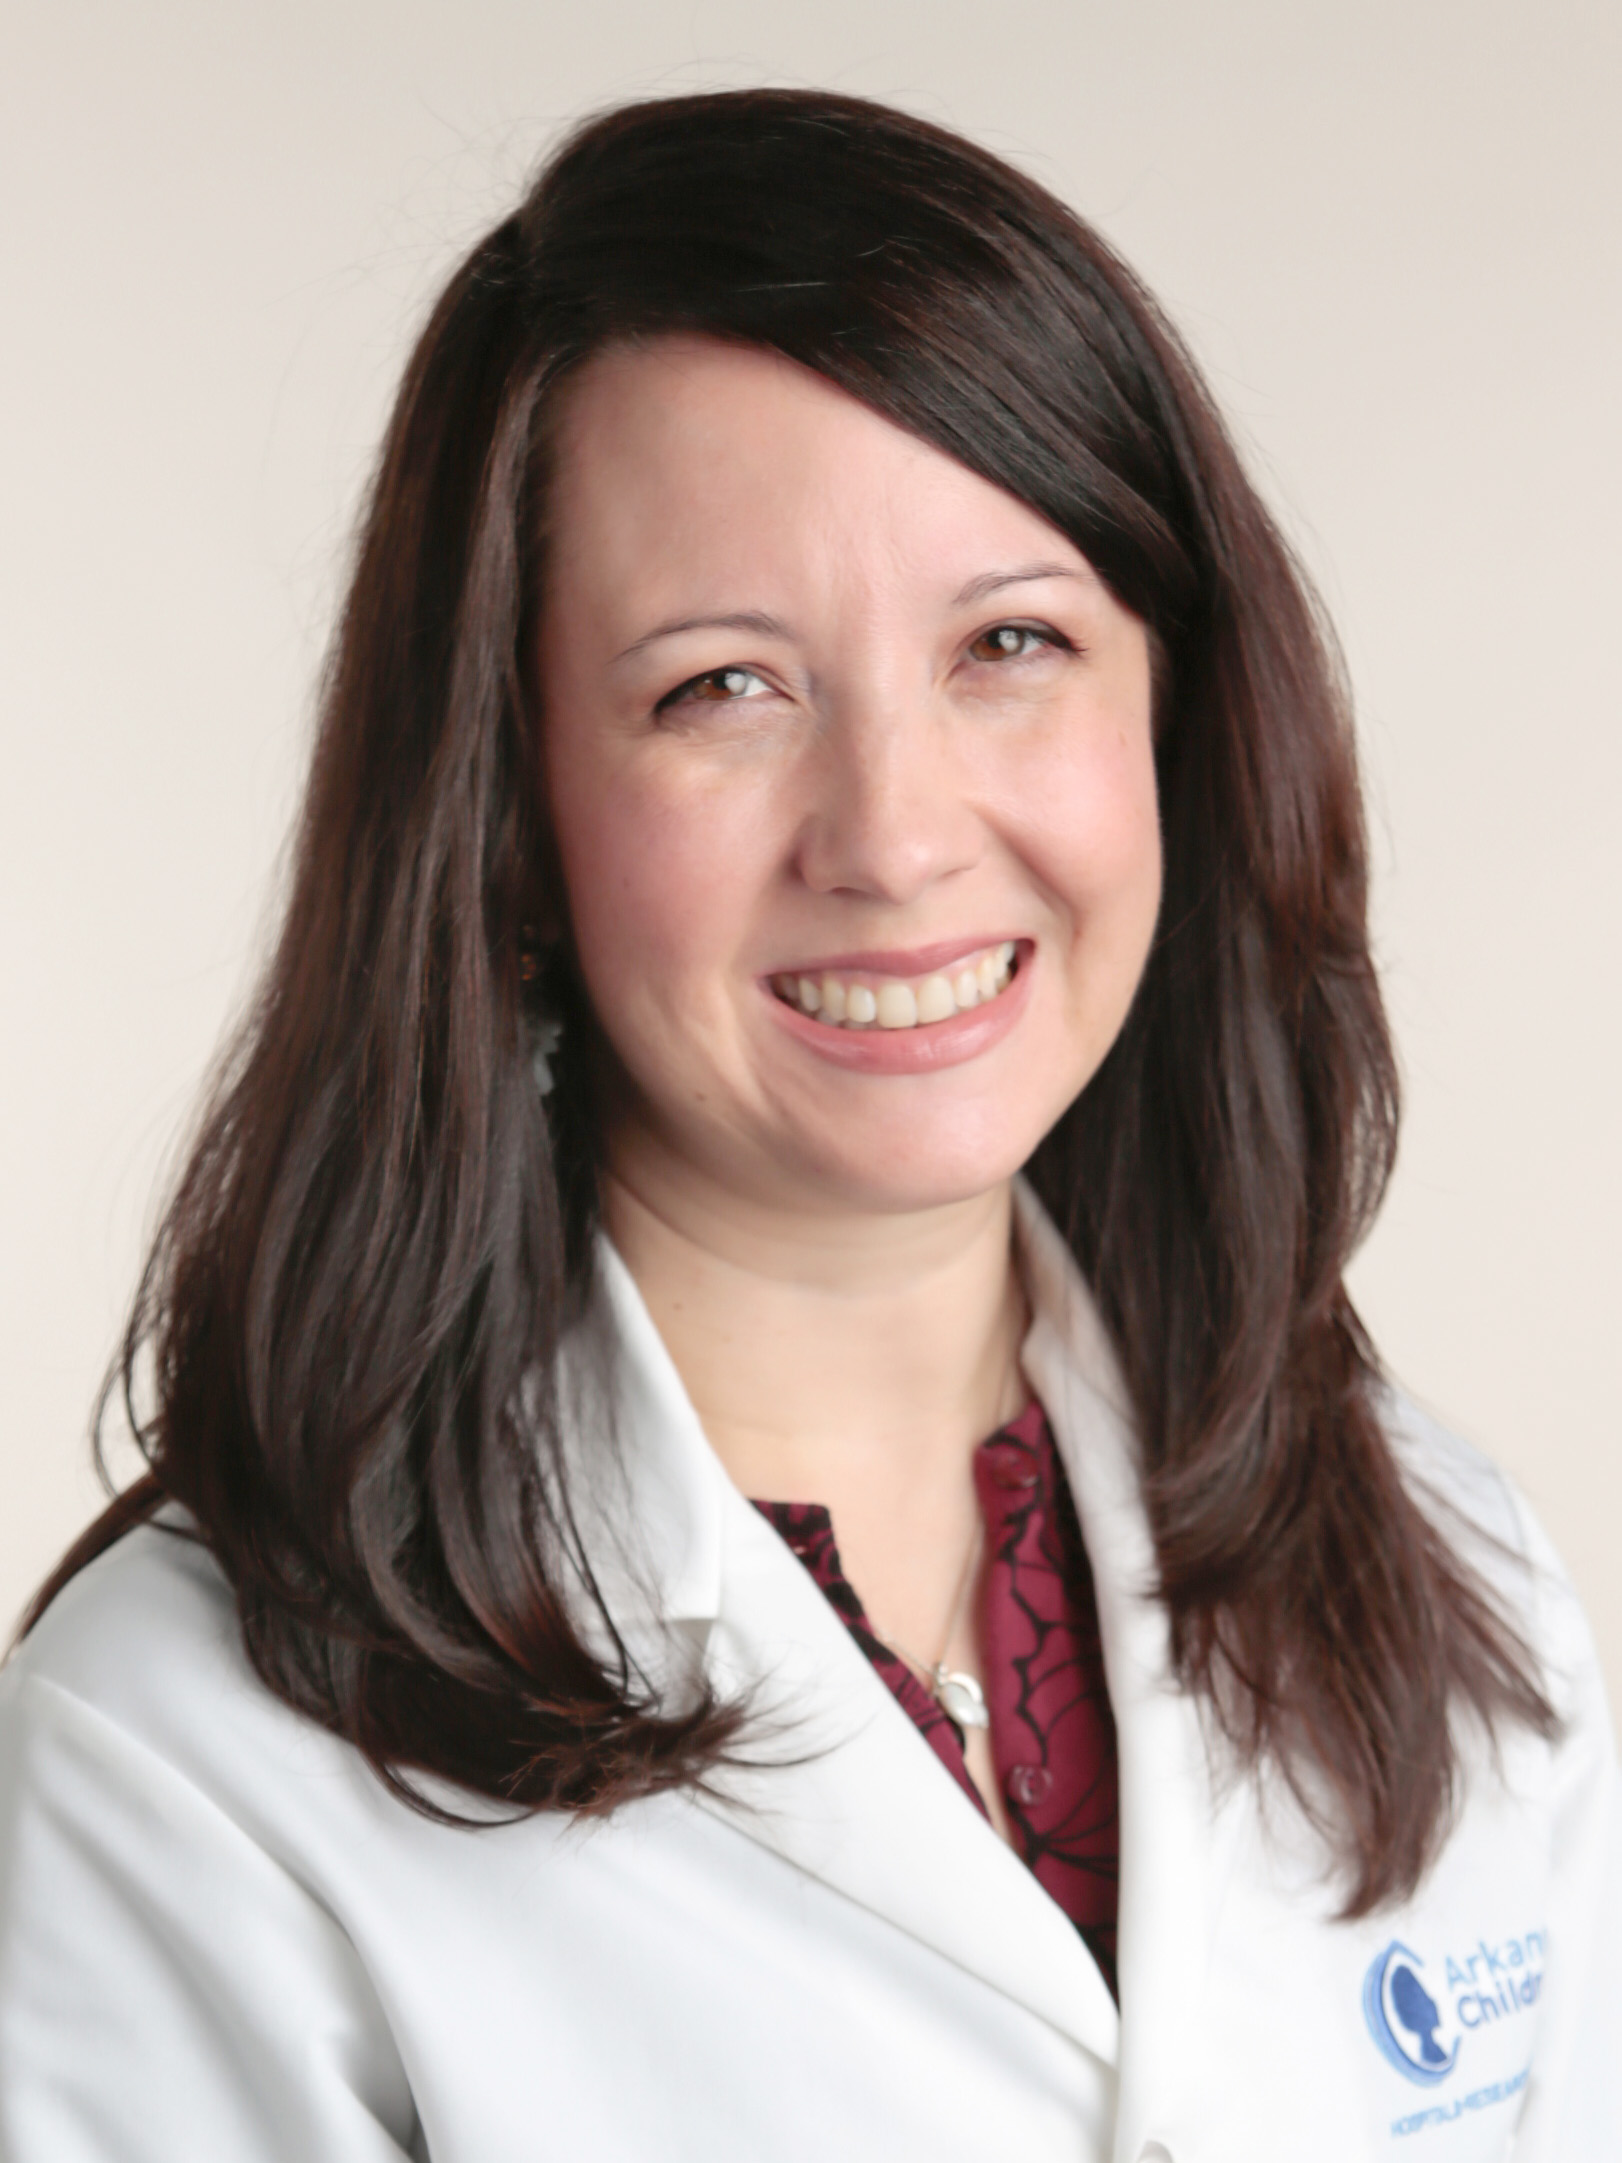 Ashley R. Antipolo, M.D. | UAMS Health